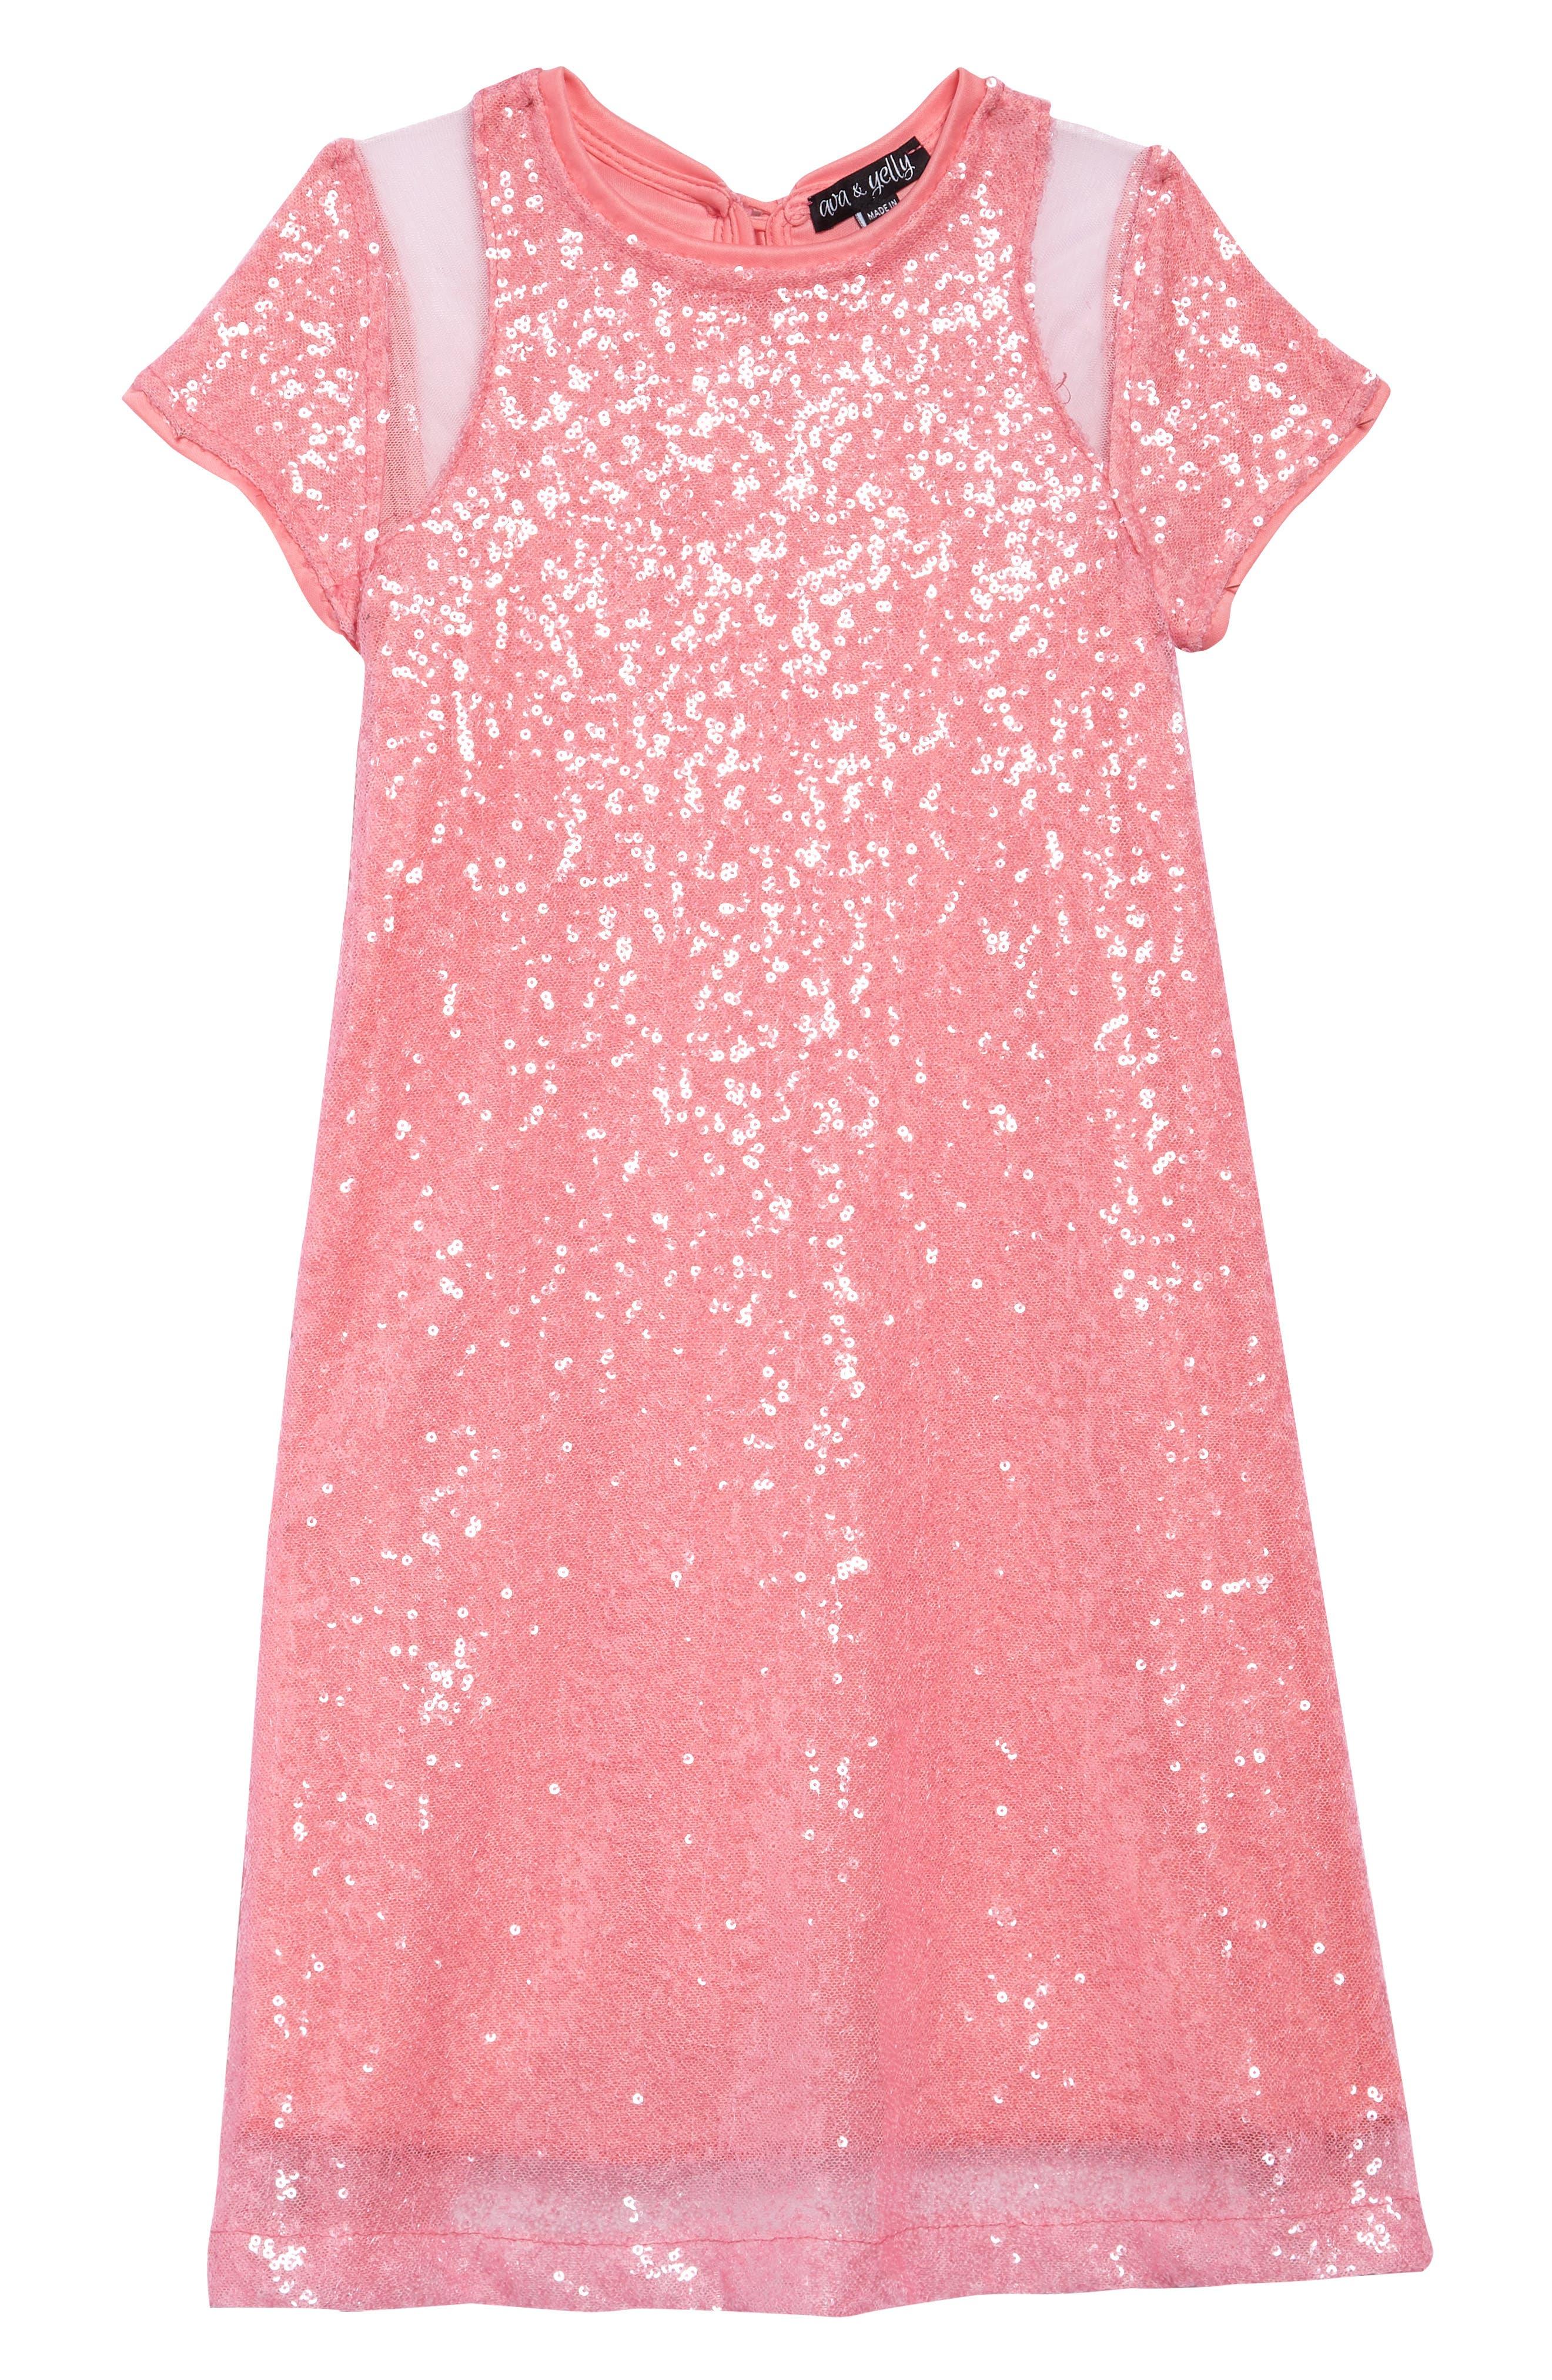 Daisy Sequin Shift Dress,                             Main thumbnail 1, color,                             650